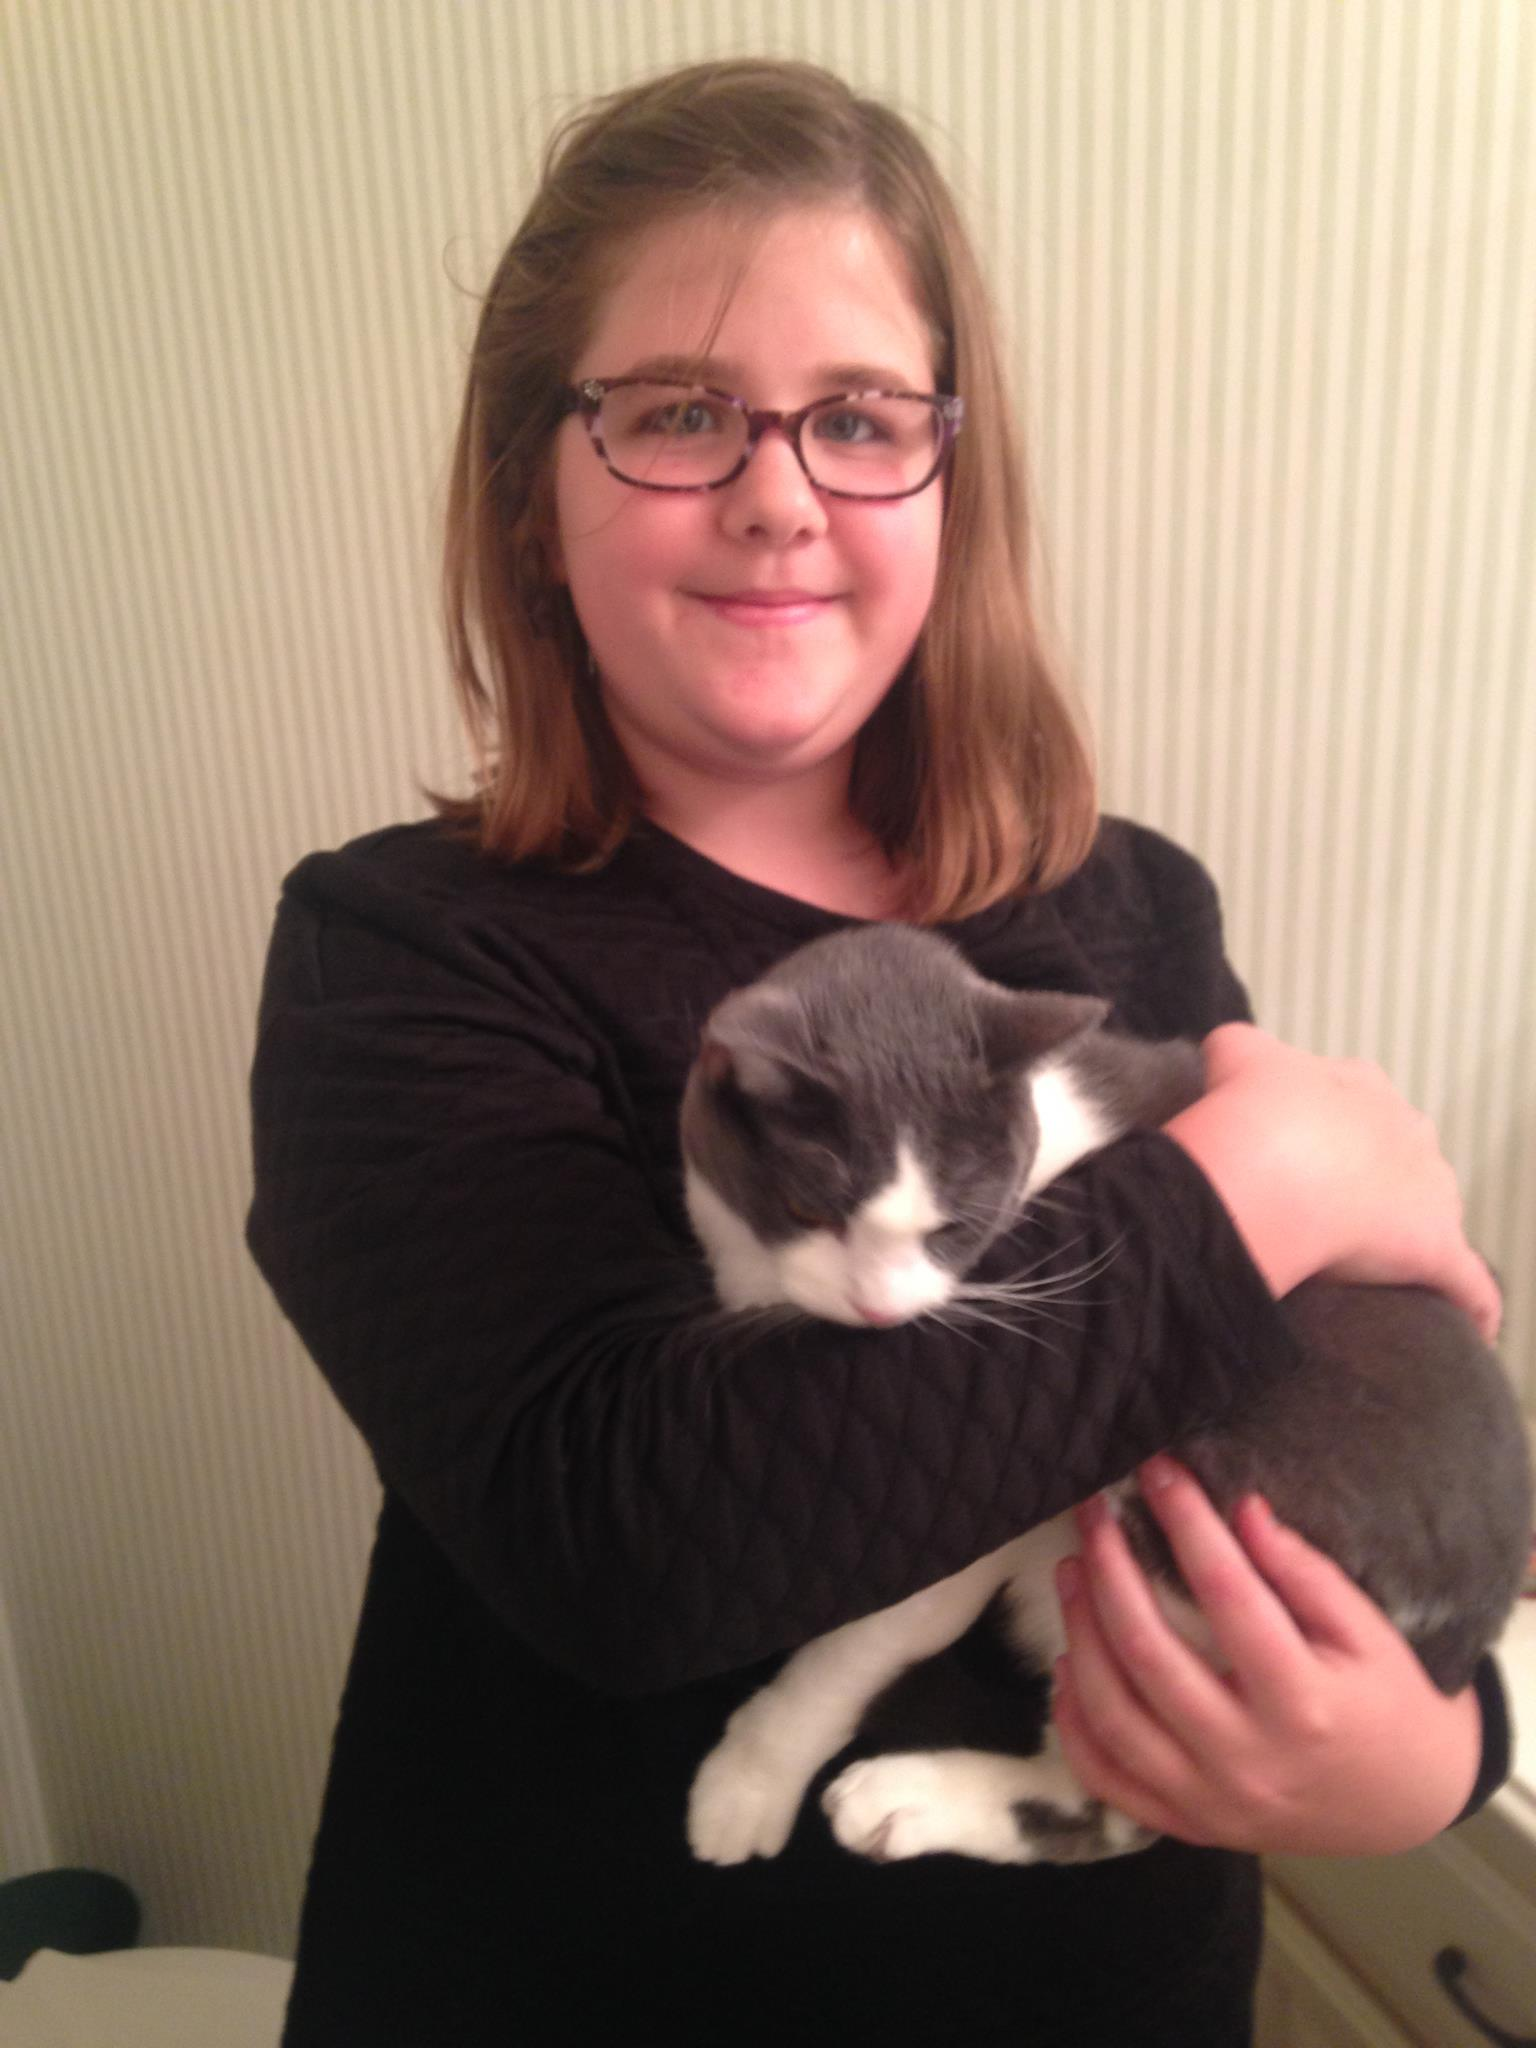 Amelia Adoption